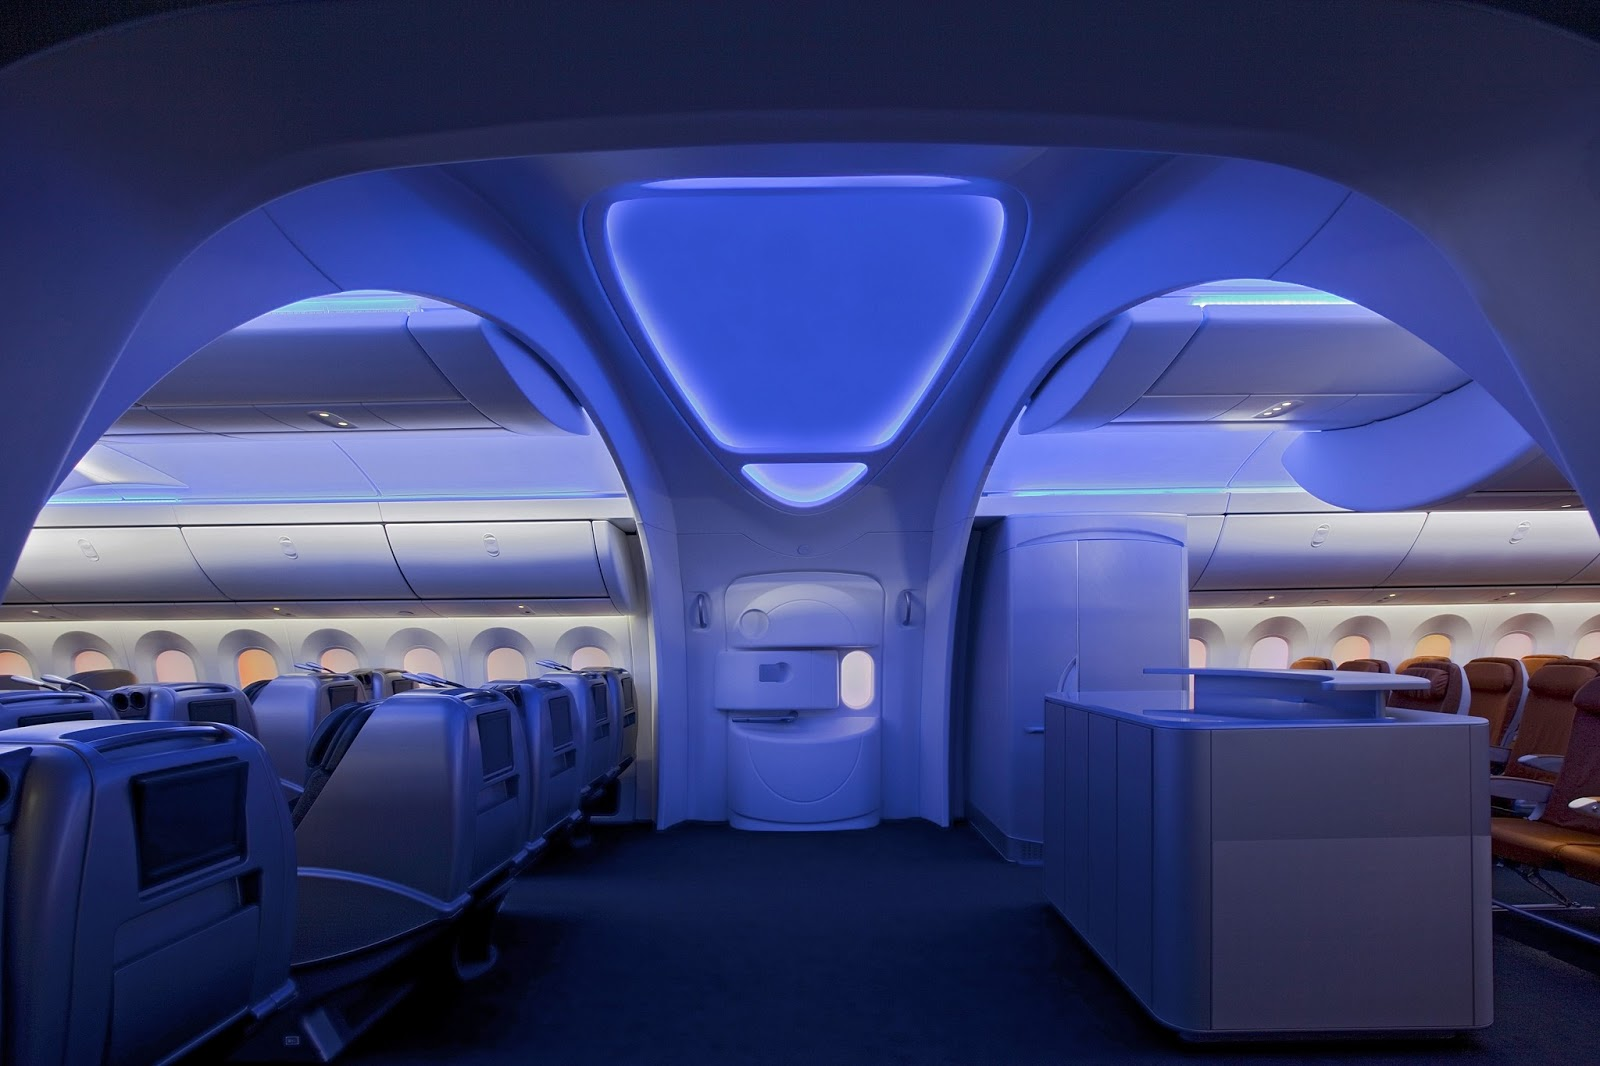 Boeing 787 9 dreamliner interior car interior design for Interior 787 dreamliner